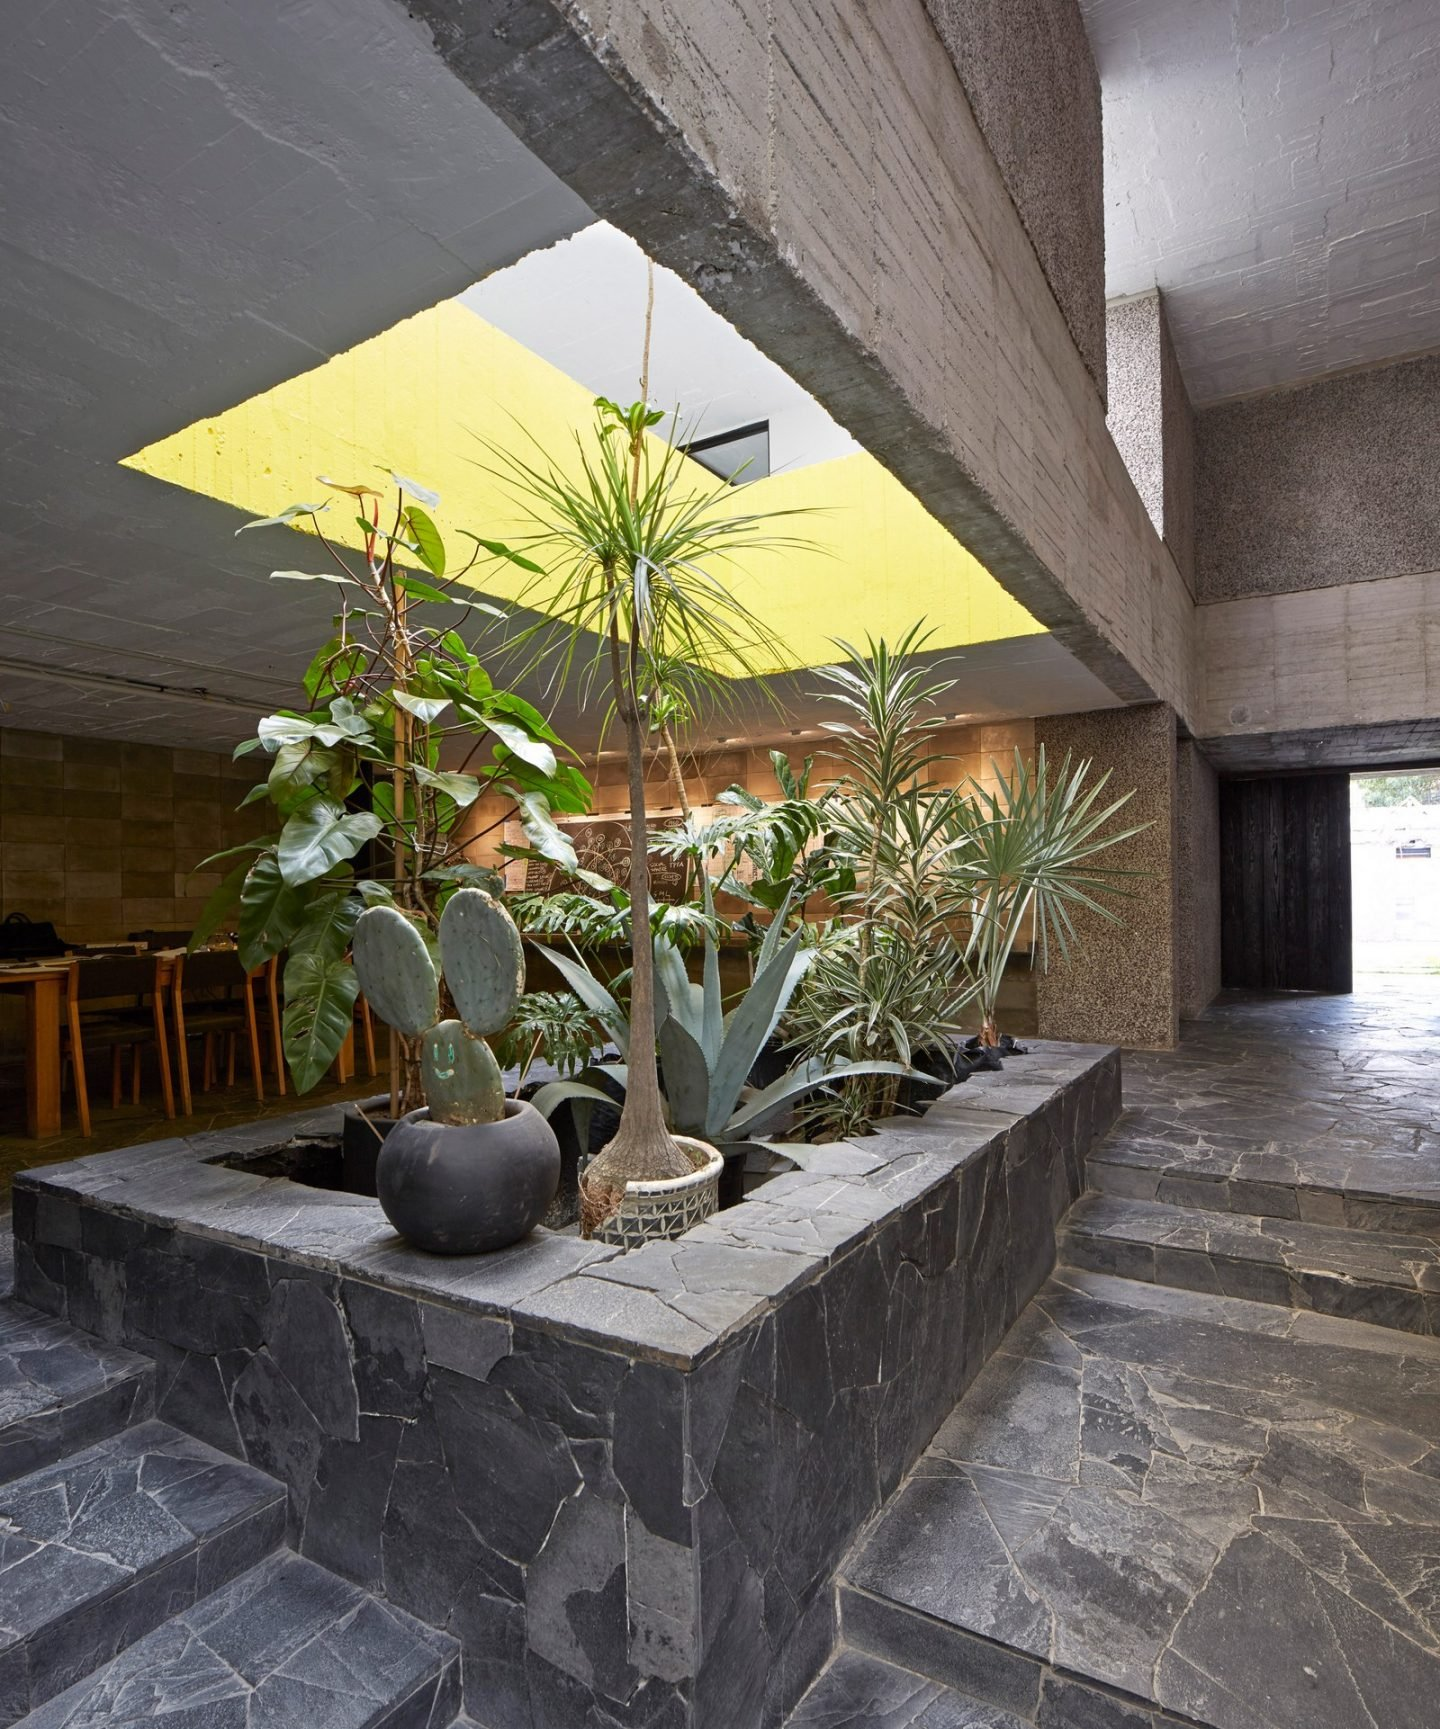 Pedro_Reyes_Architecture (10)